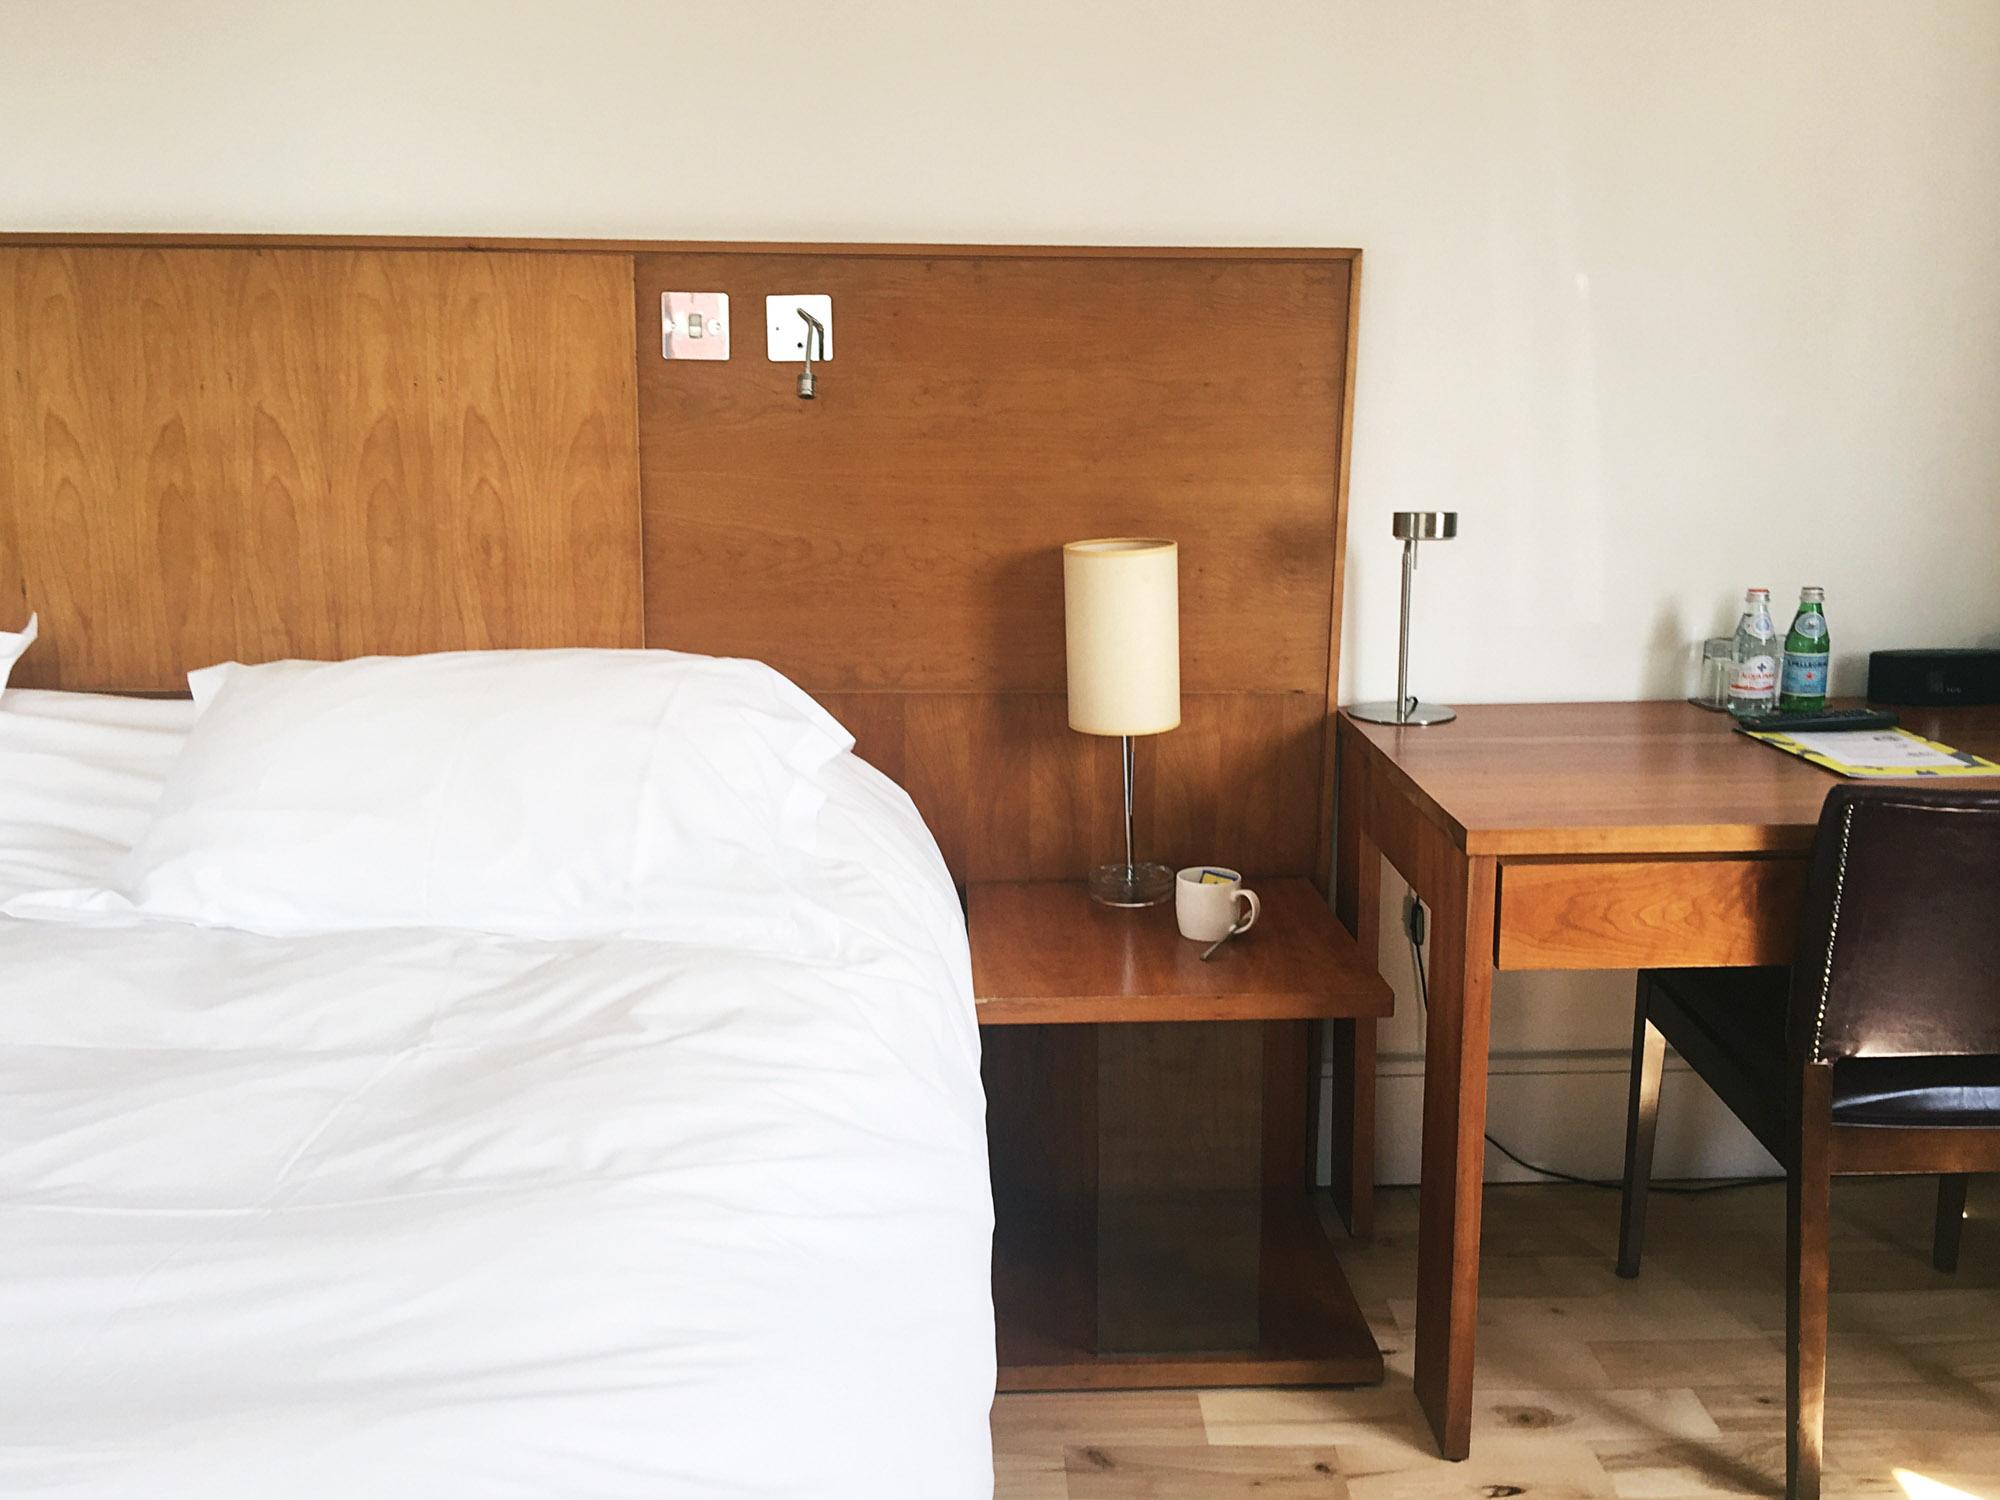 Best hotels in Liverpoo l- Hope Street Hotel